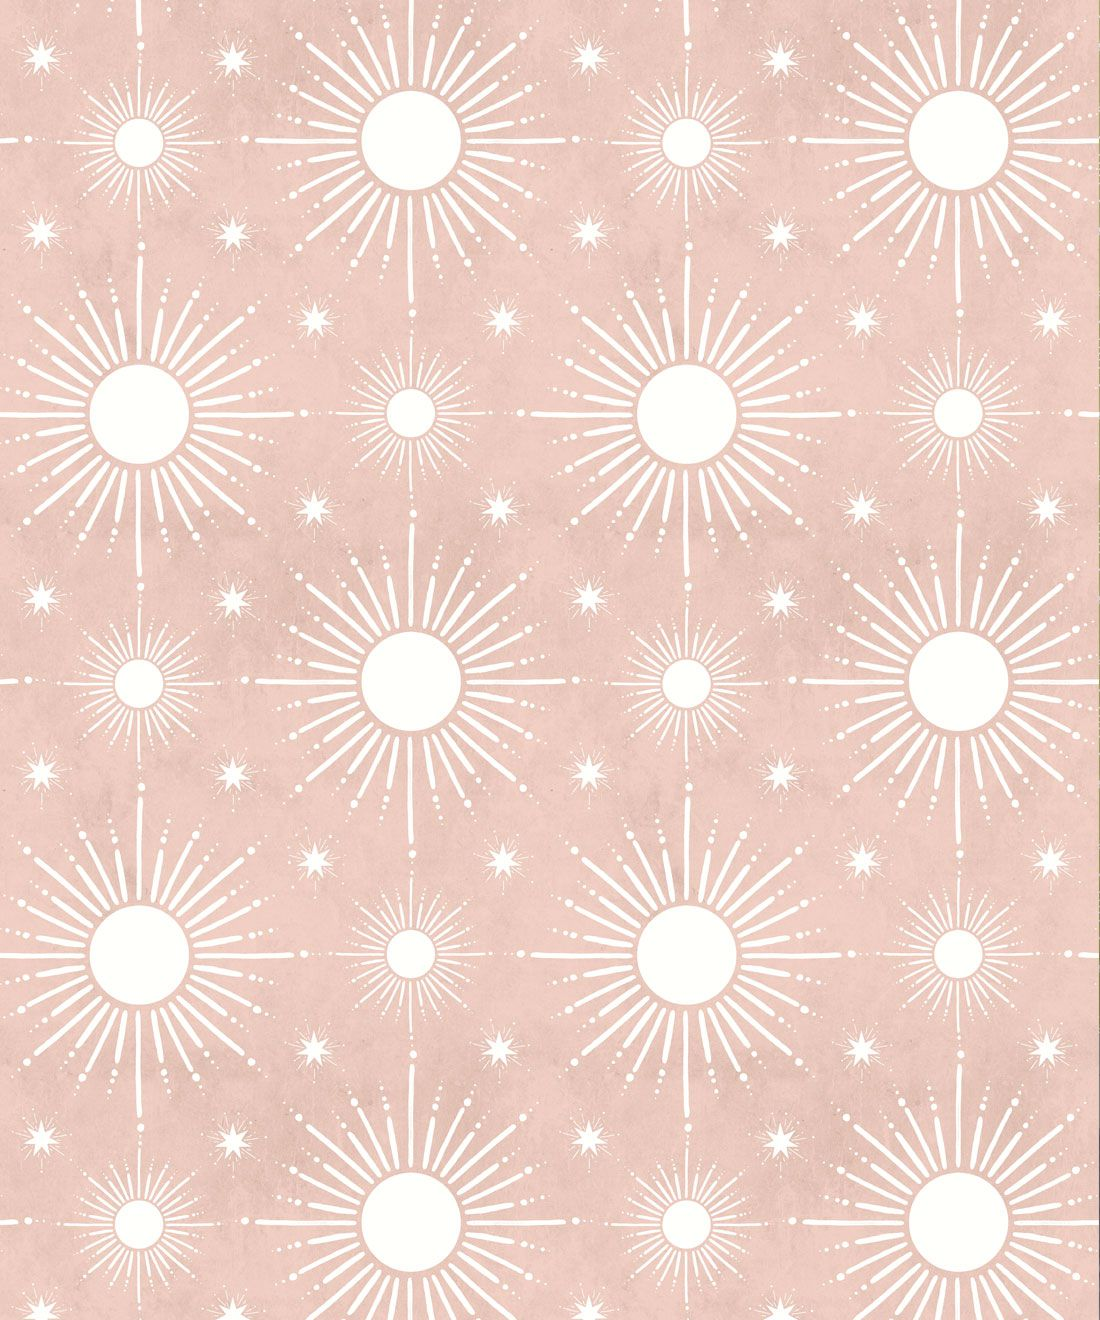 Sun Light Star Bright Wallpaper • Dusty Pink • Swatch